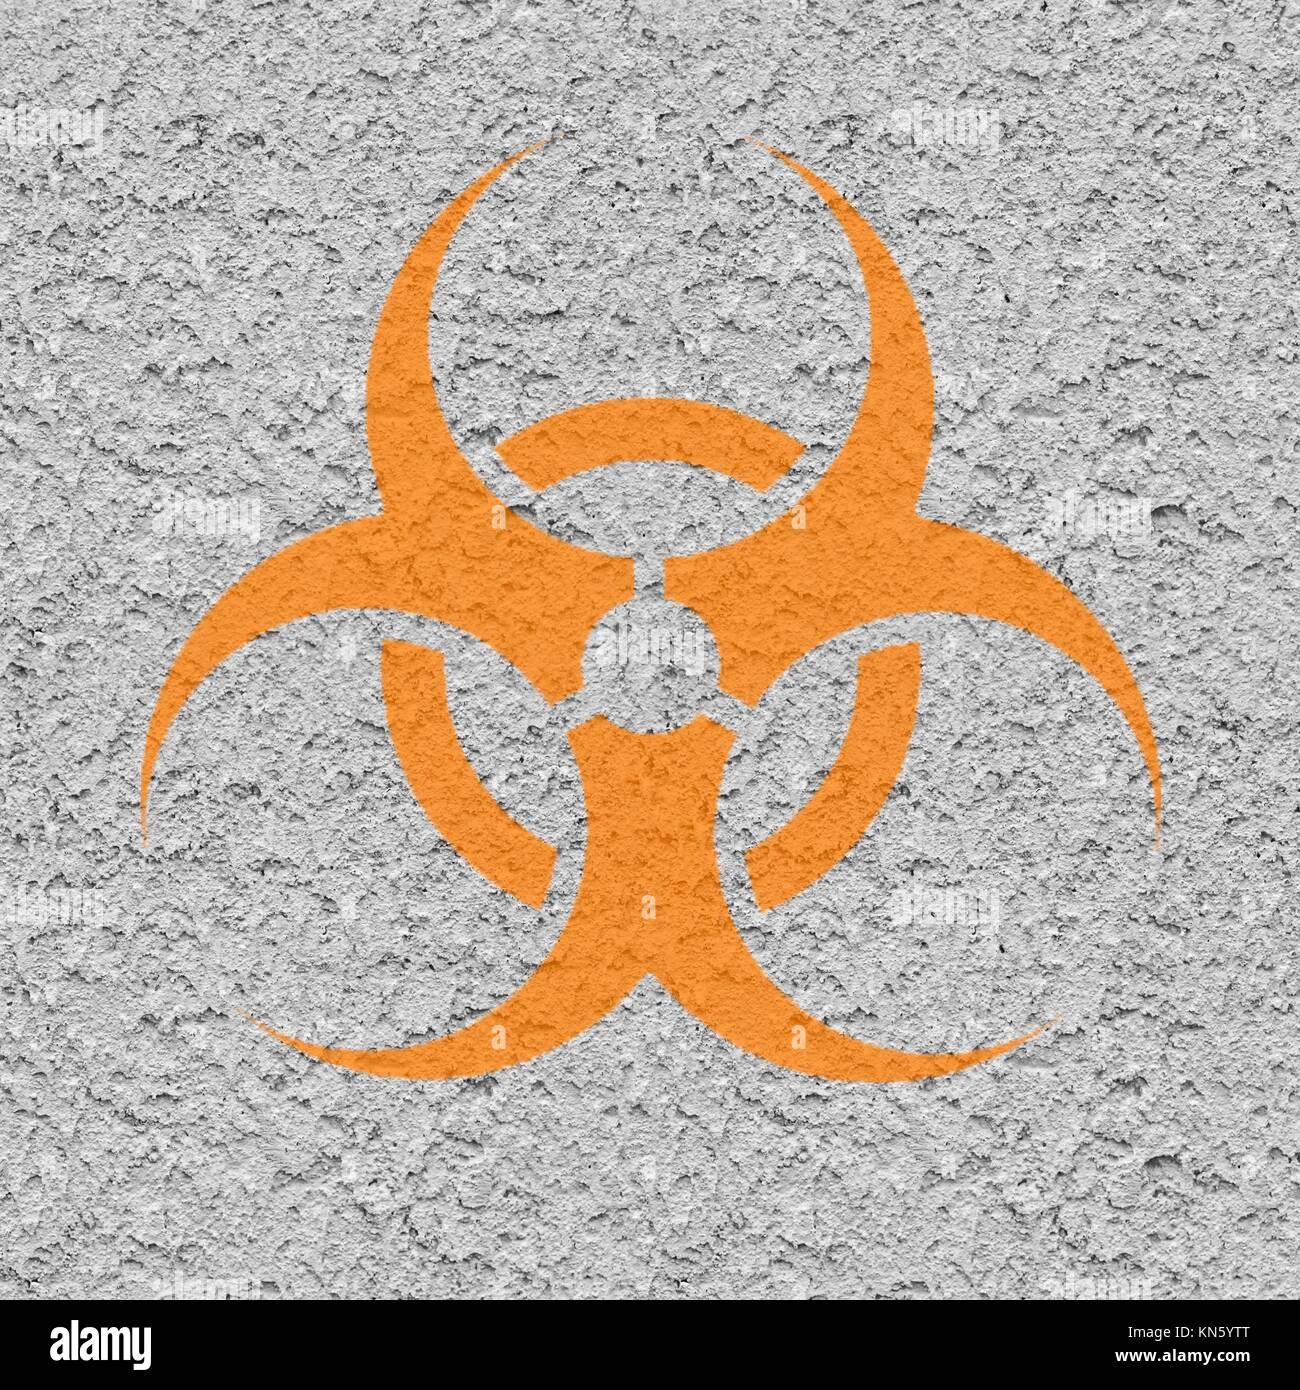 Biohazard symbol on old dirty concret wall stock photo 167932712 biohazard symbol on old dirty concret wall biocorpaavc Choice Image